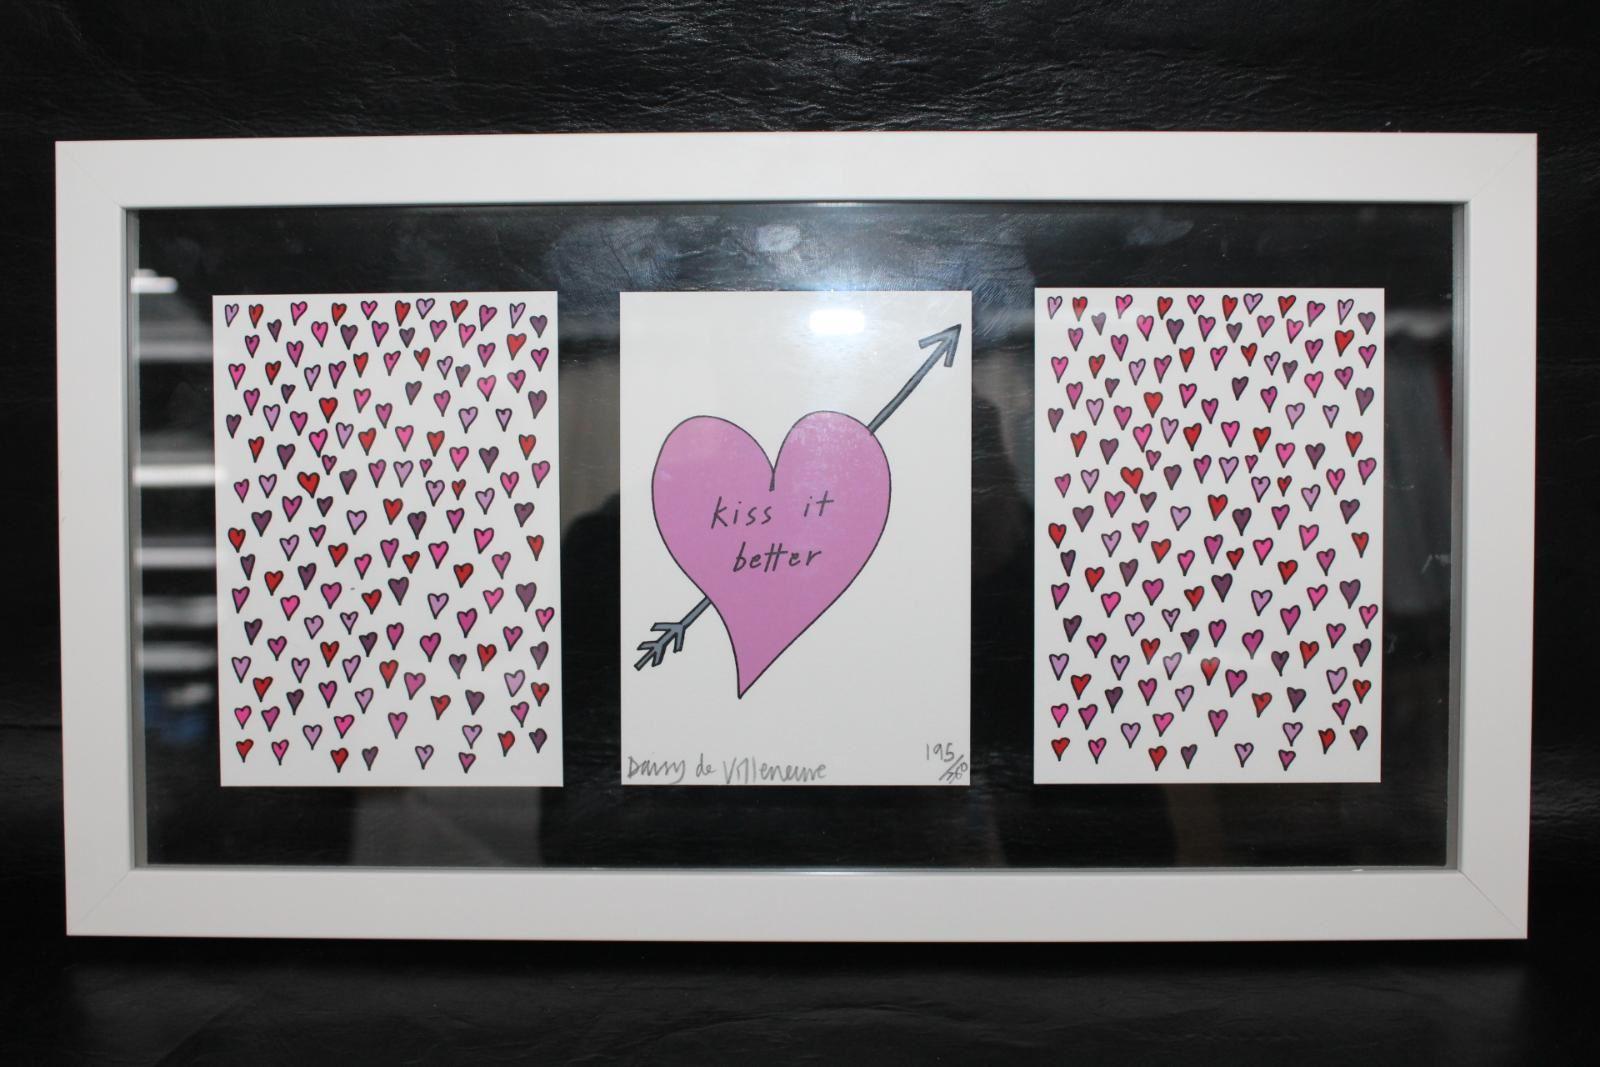 DAISY-DE-VILLENEUVE-Kiss-It-Better-Limited-Edition-Framed-Wall-Print-195-380